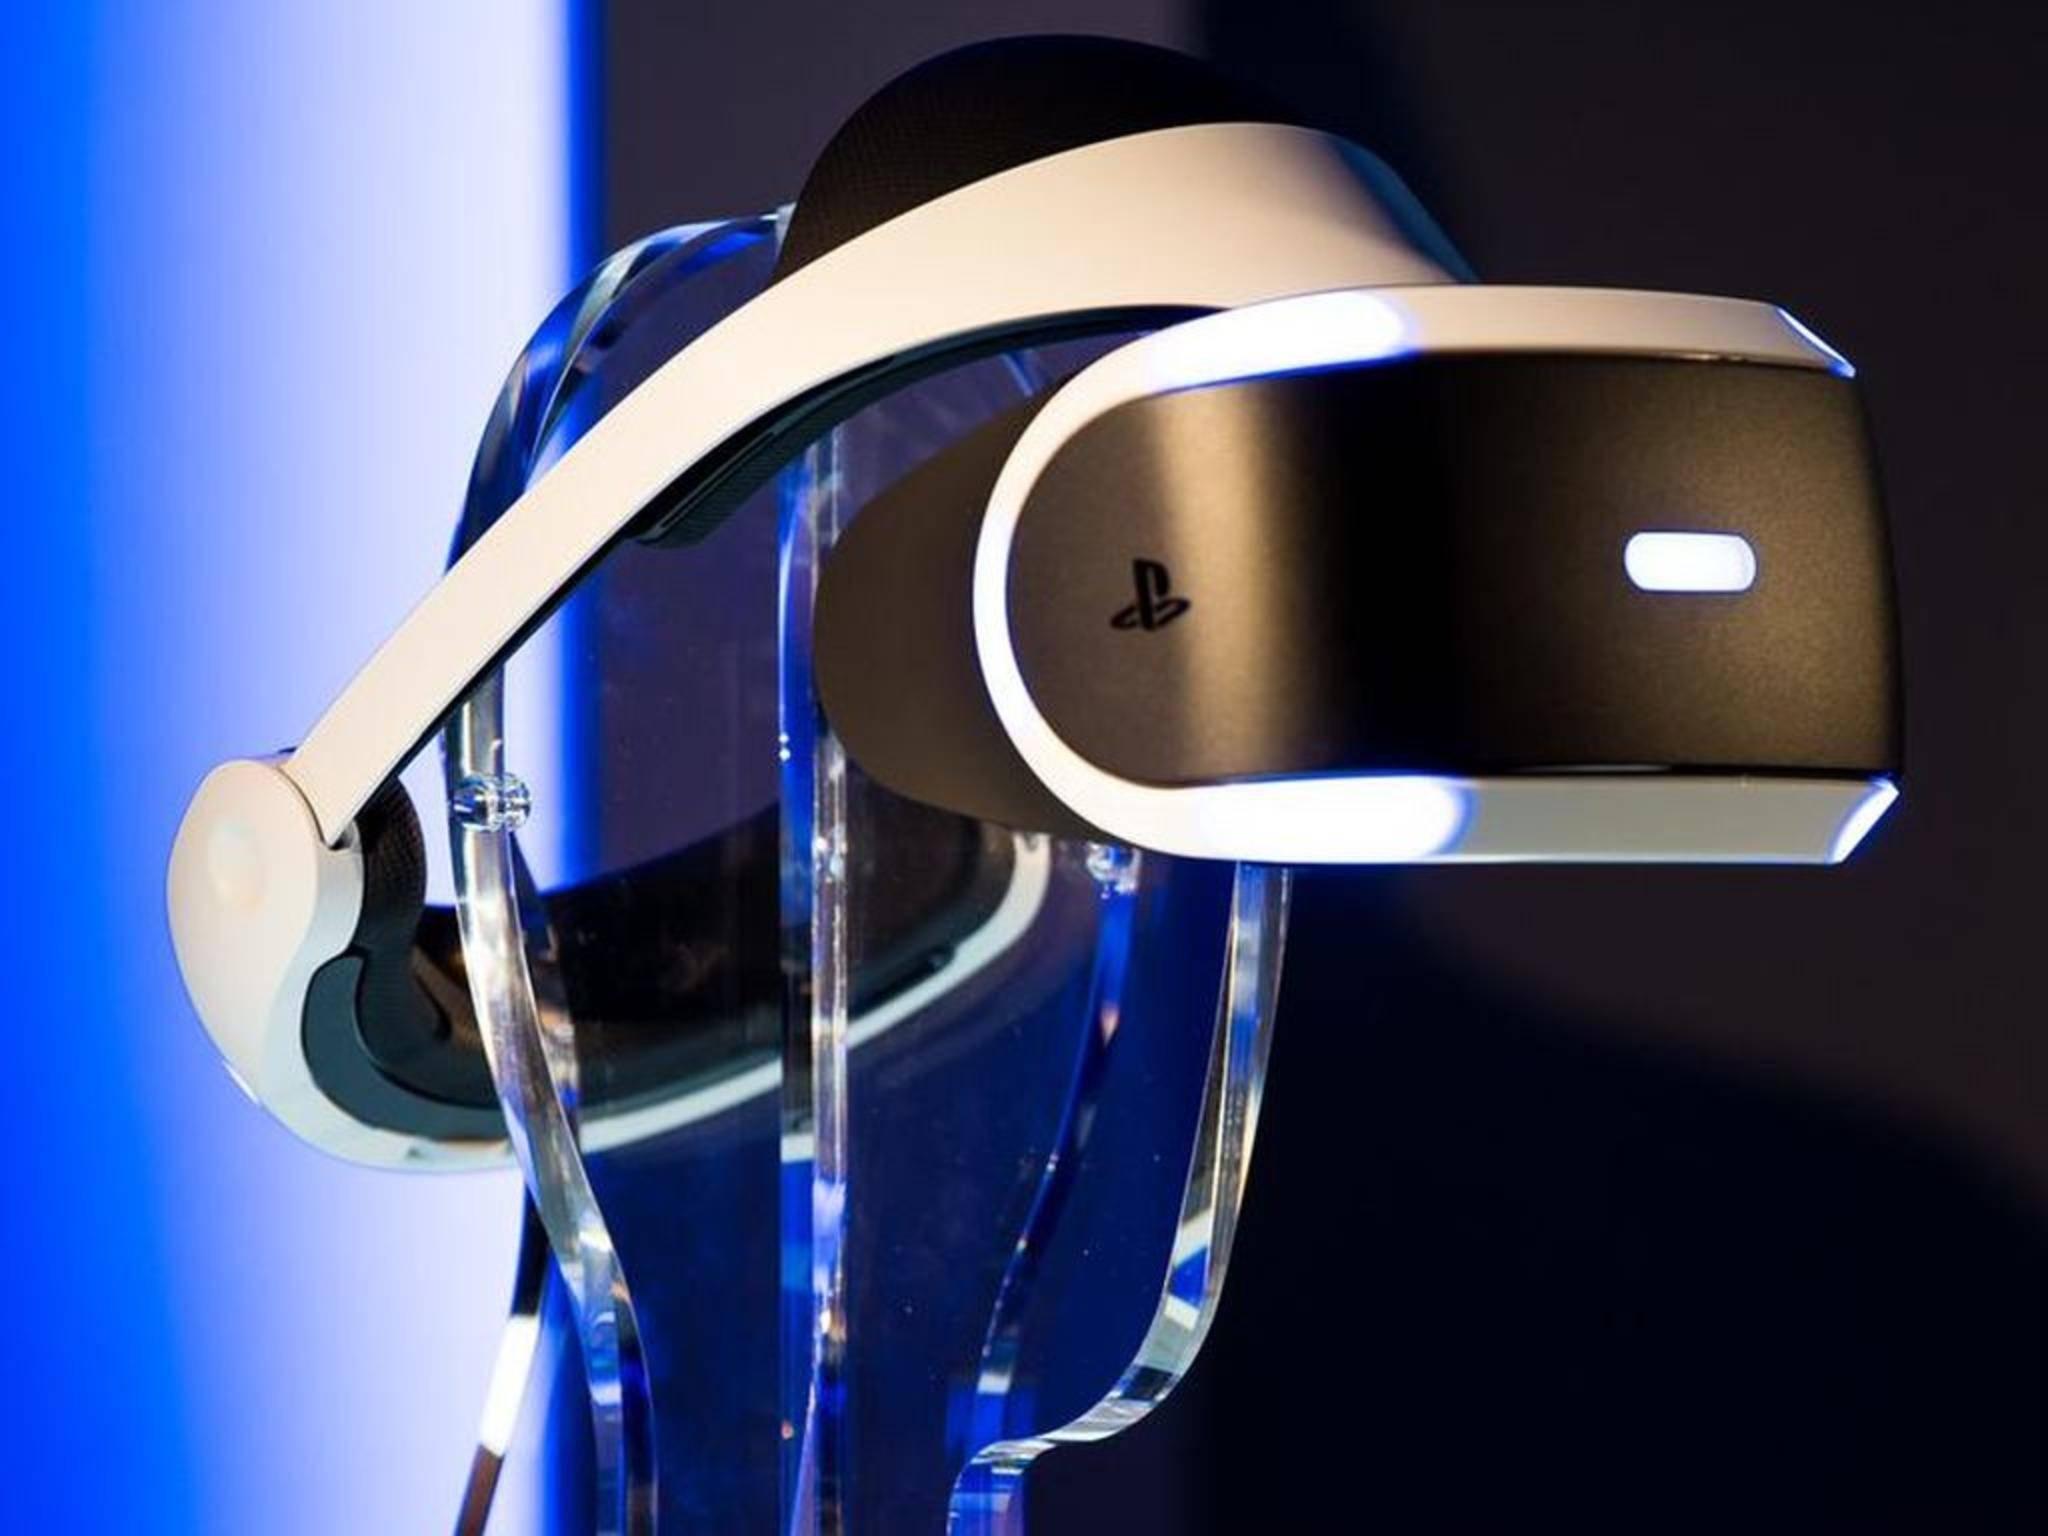 ... PlayStation VR noch in Planung ist.